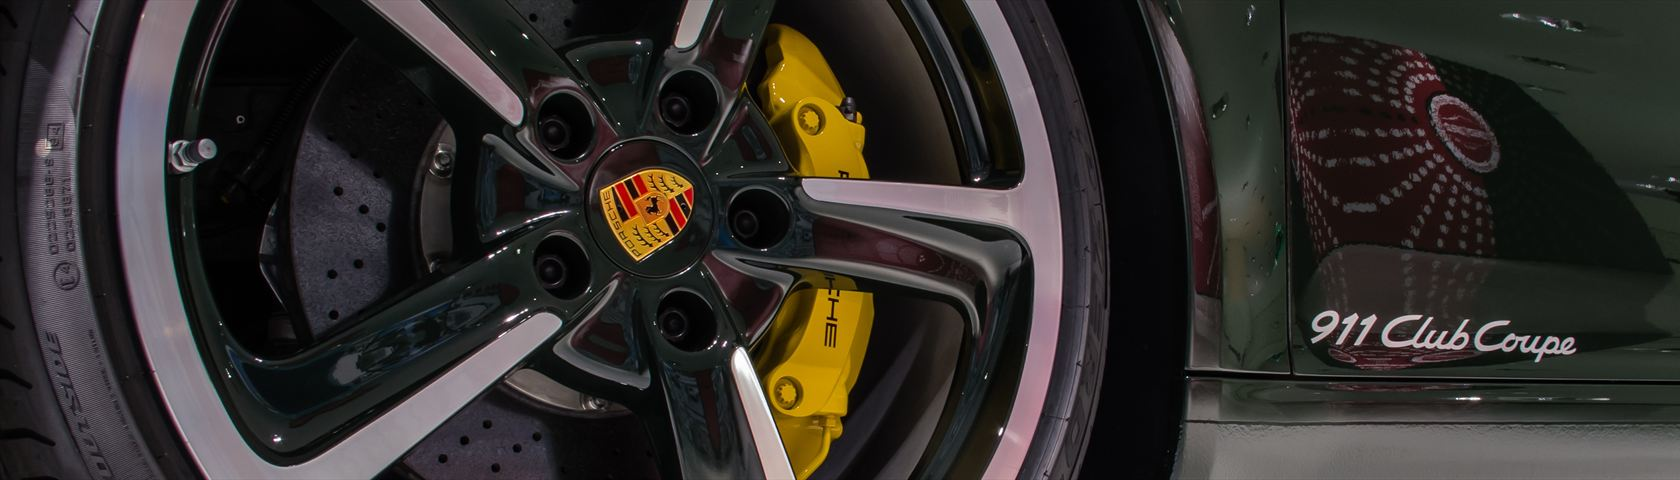 911 Club Coupe Rim